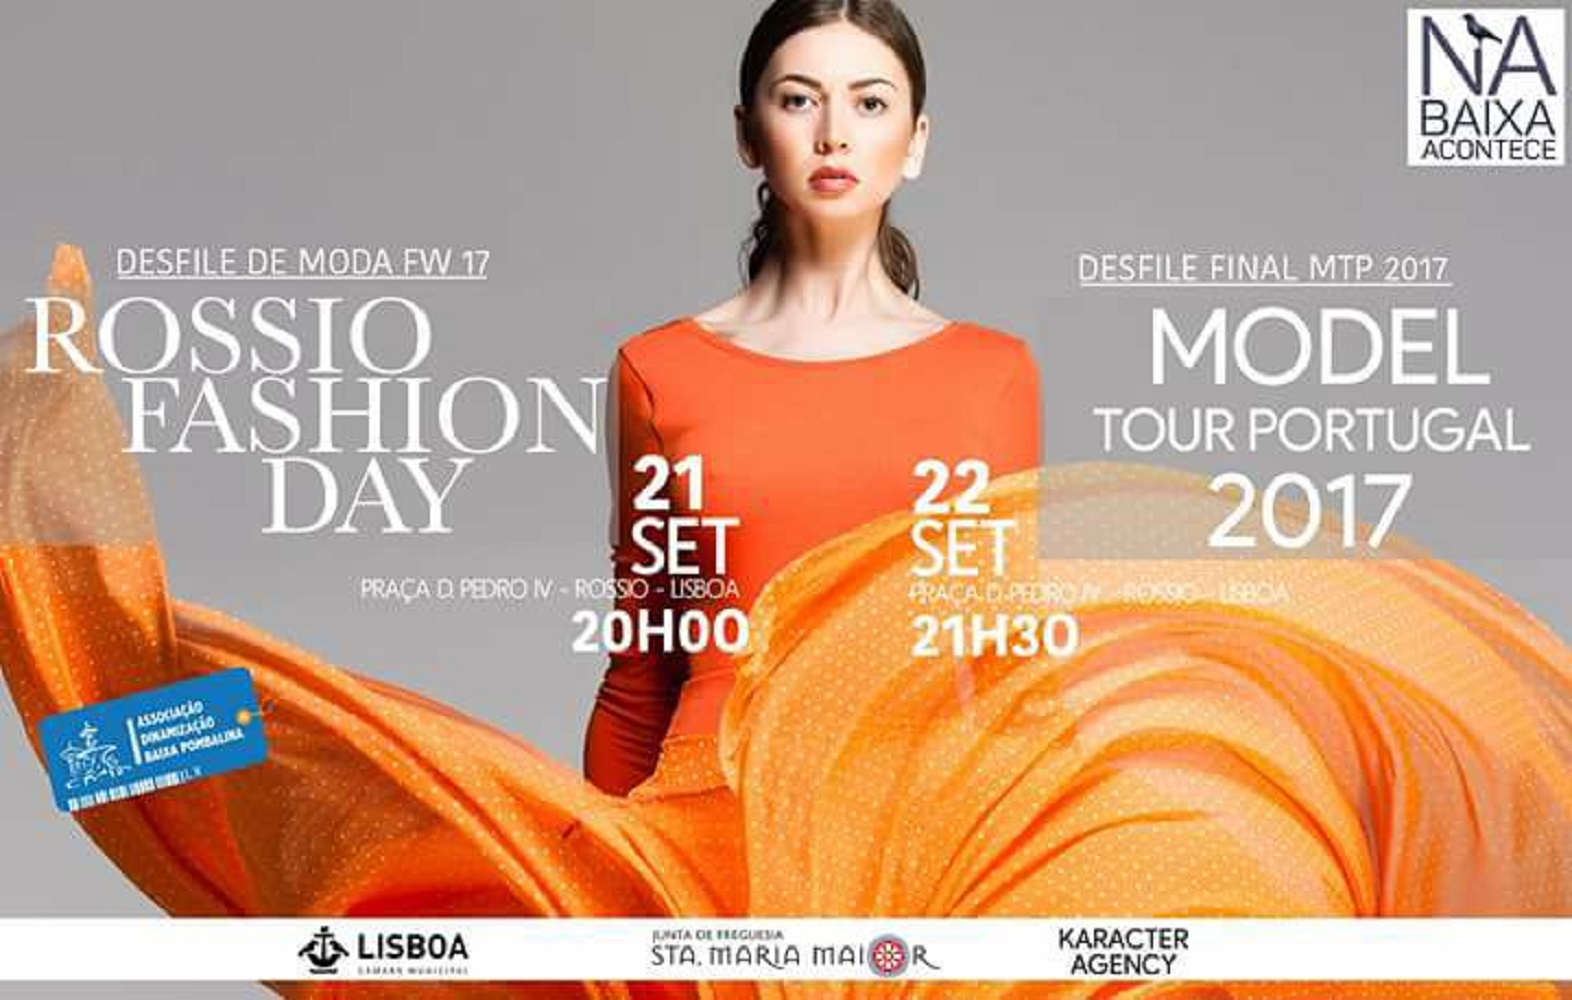 Rossio Fashion Day